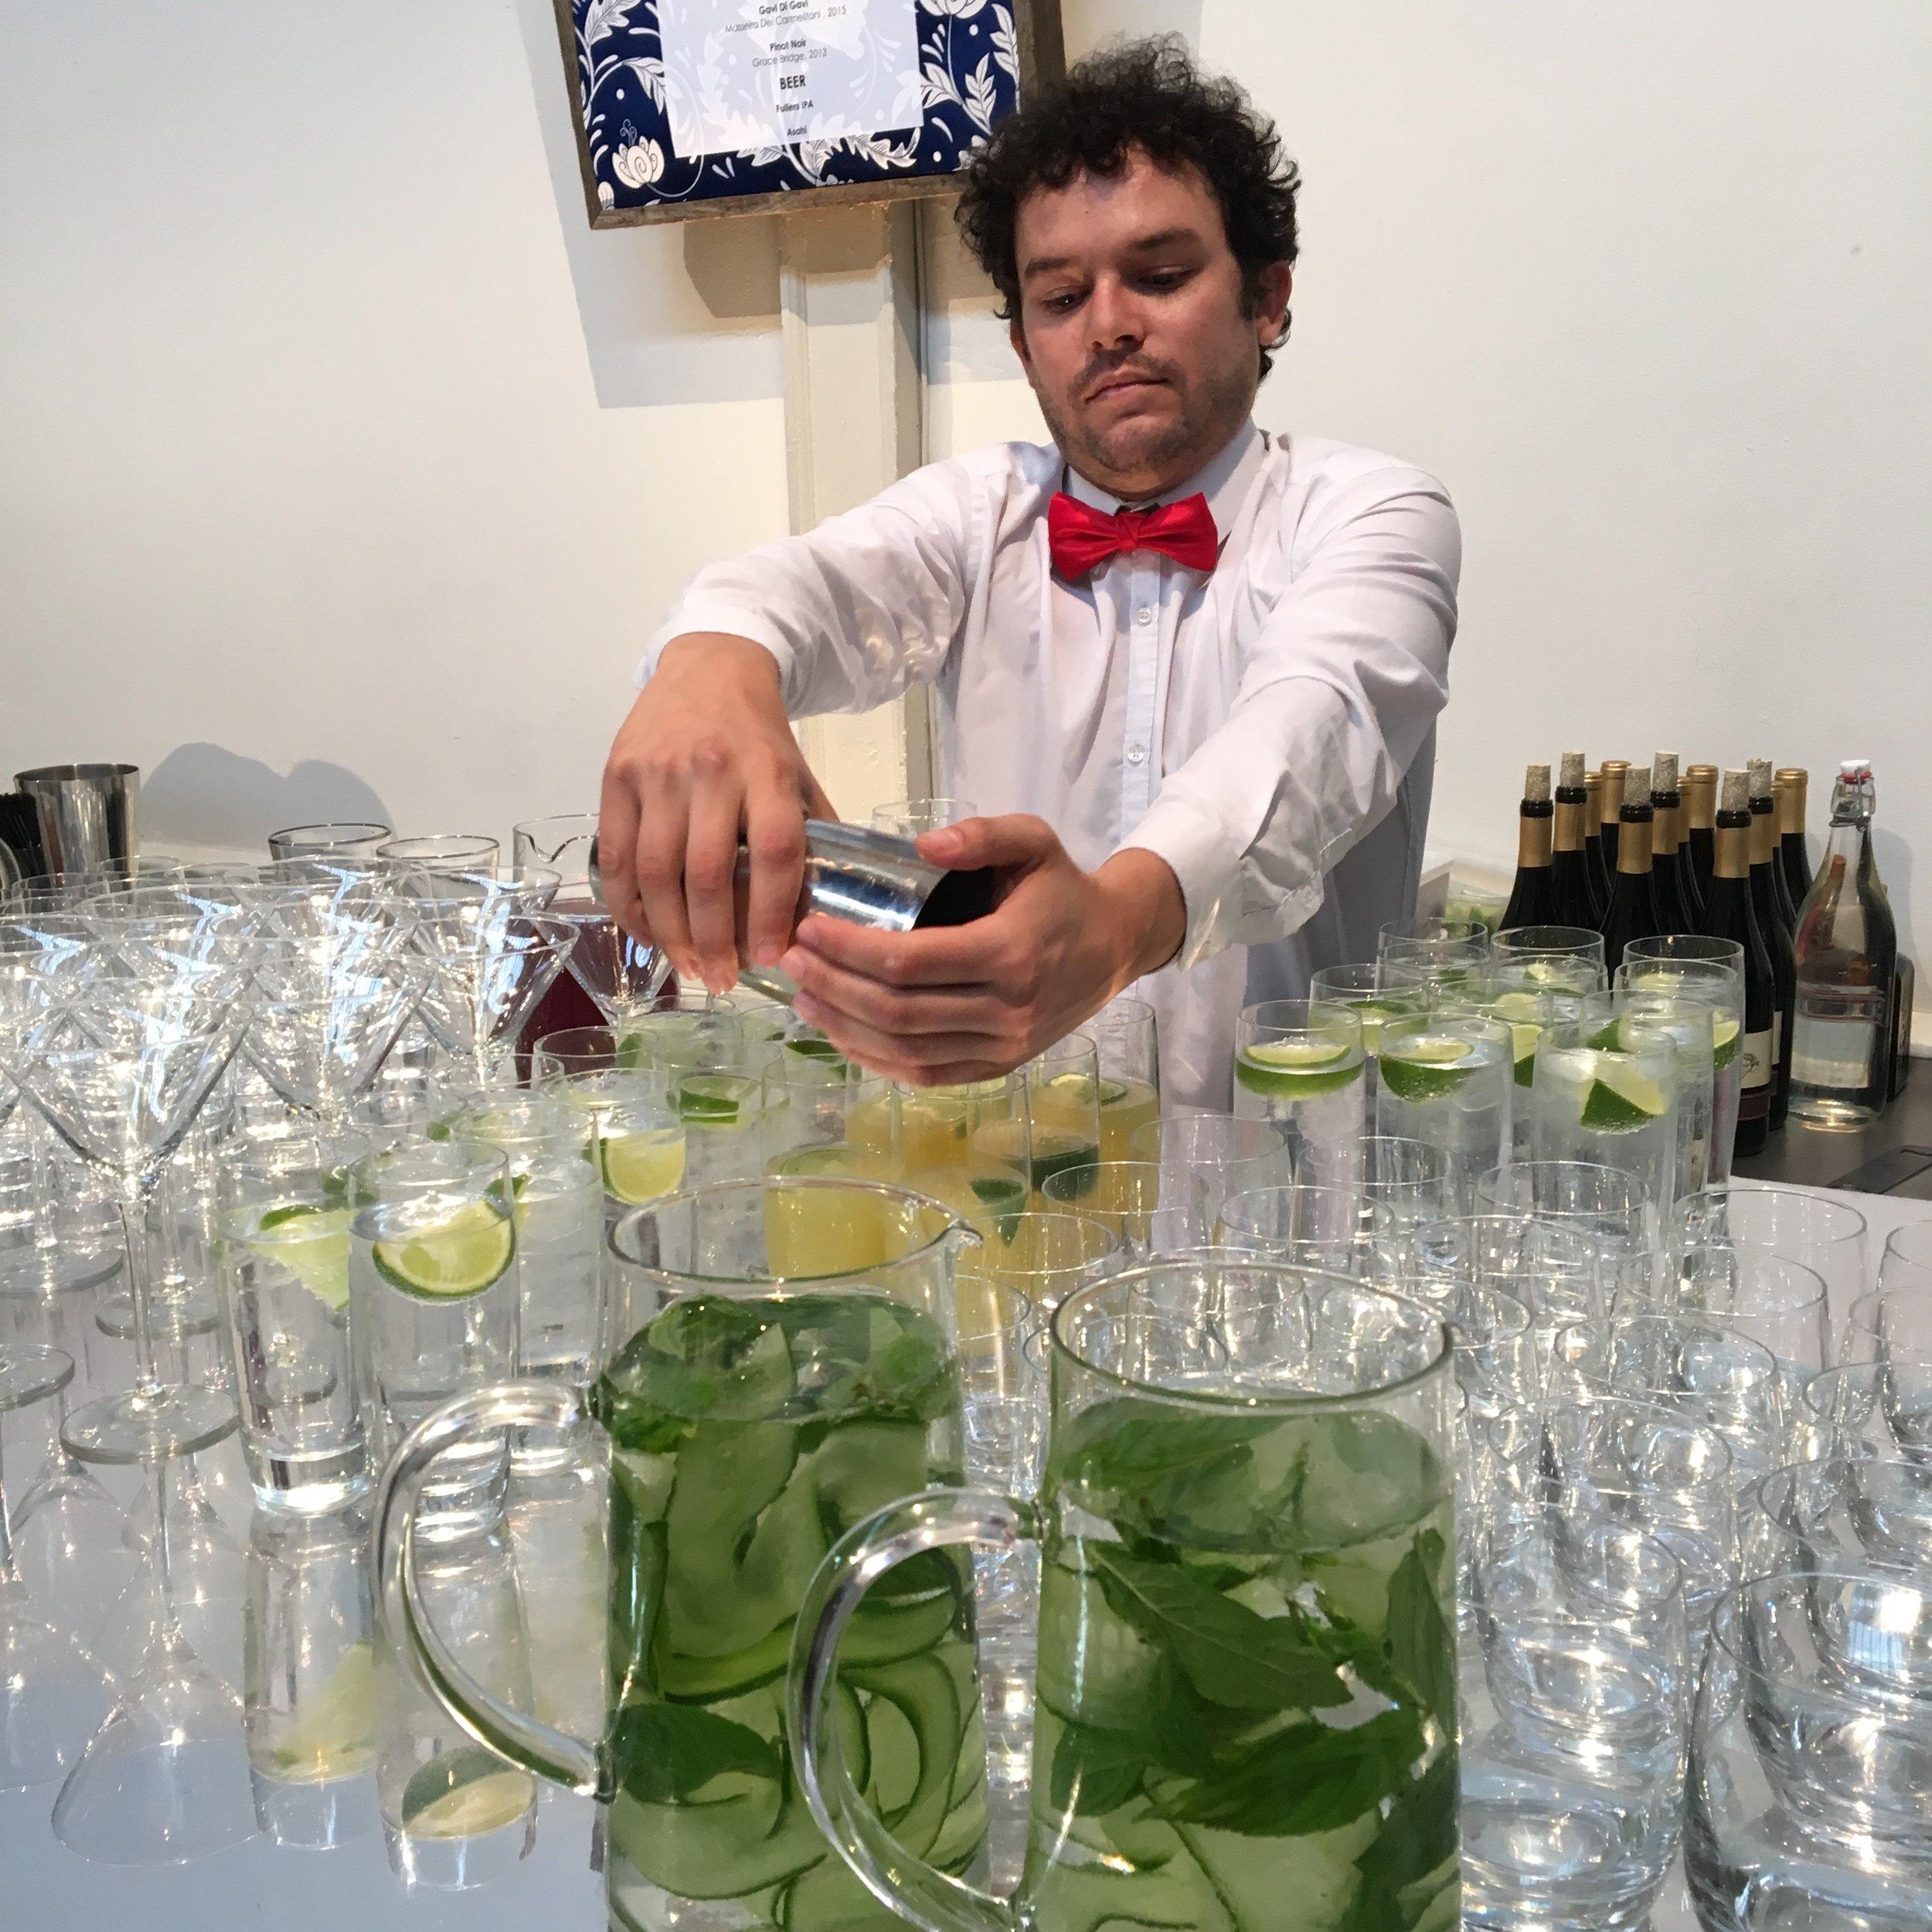 Bartender Remi prepping for a wedding reception